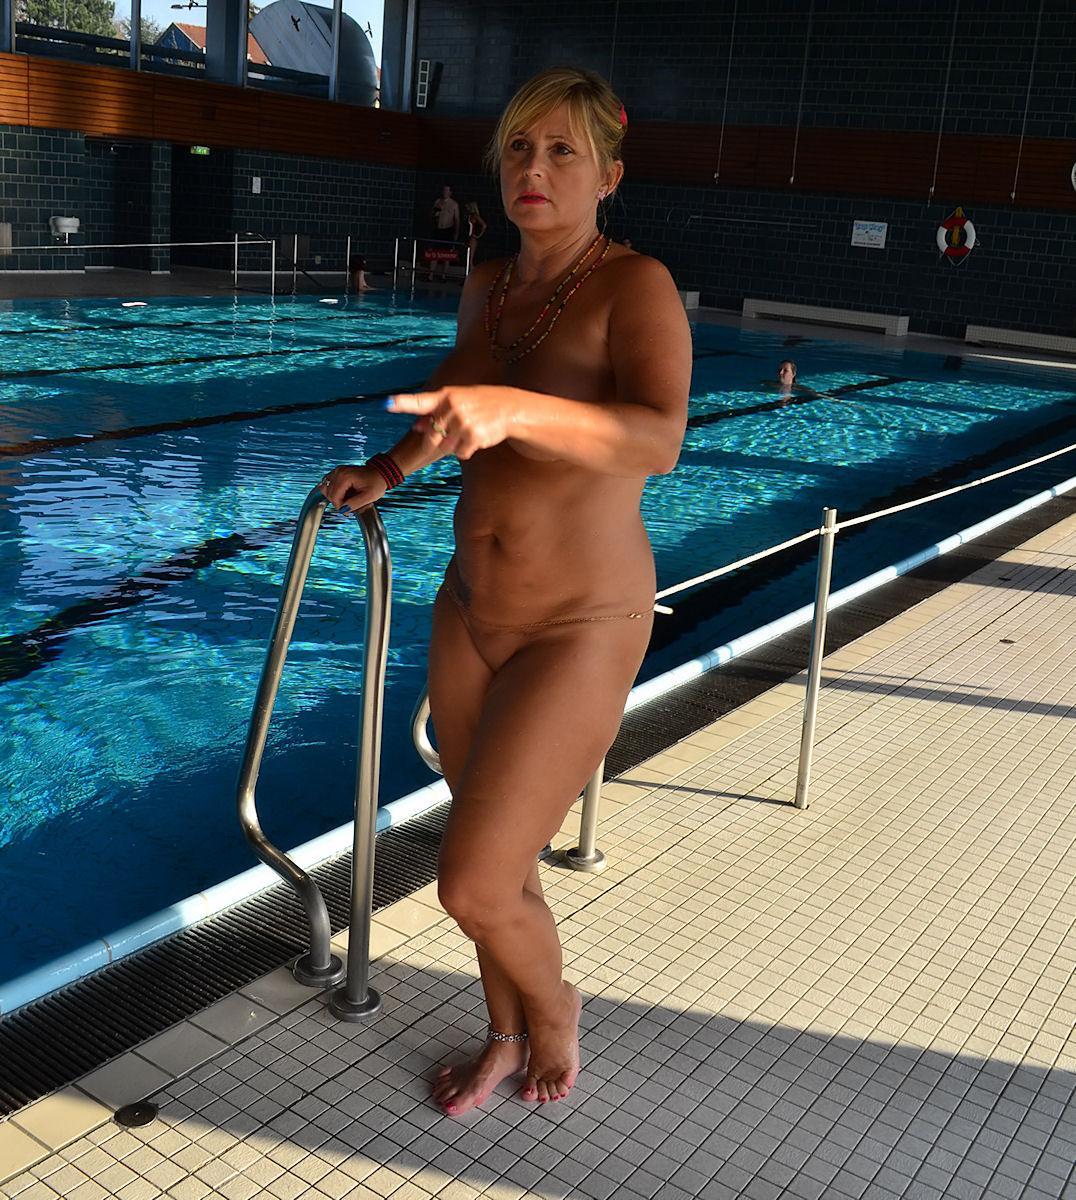 Schwimmbad Nackt